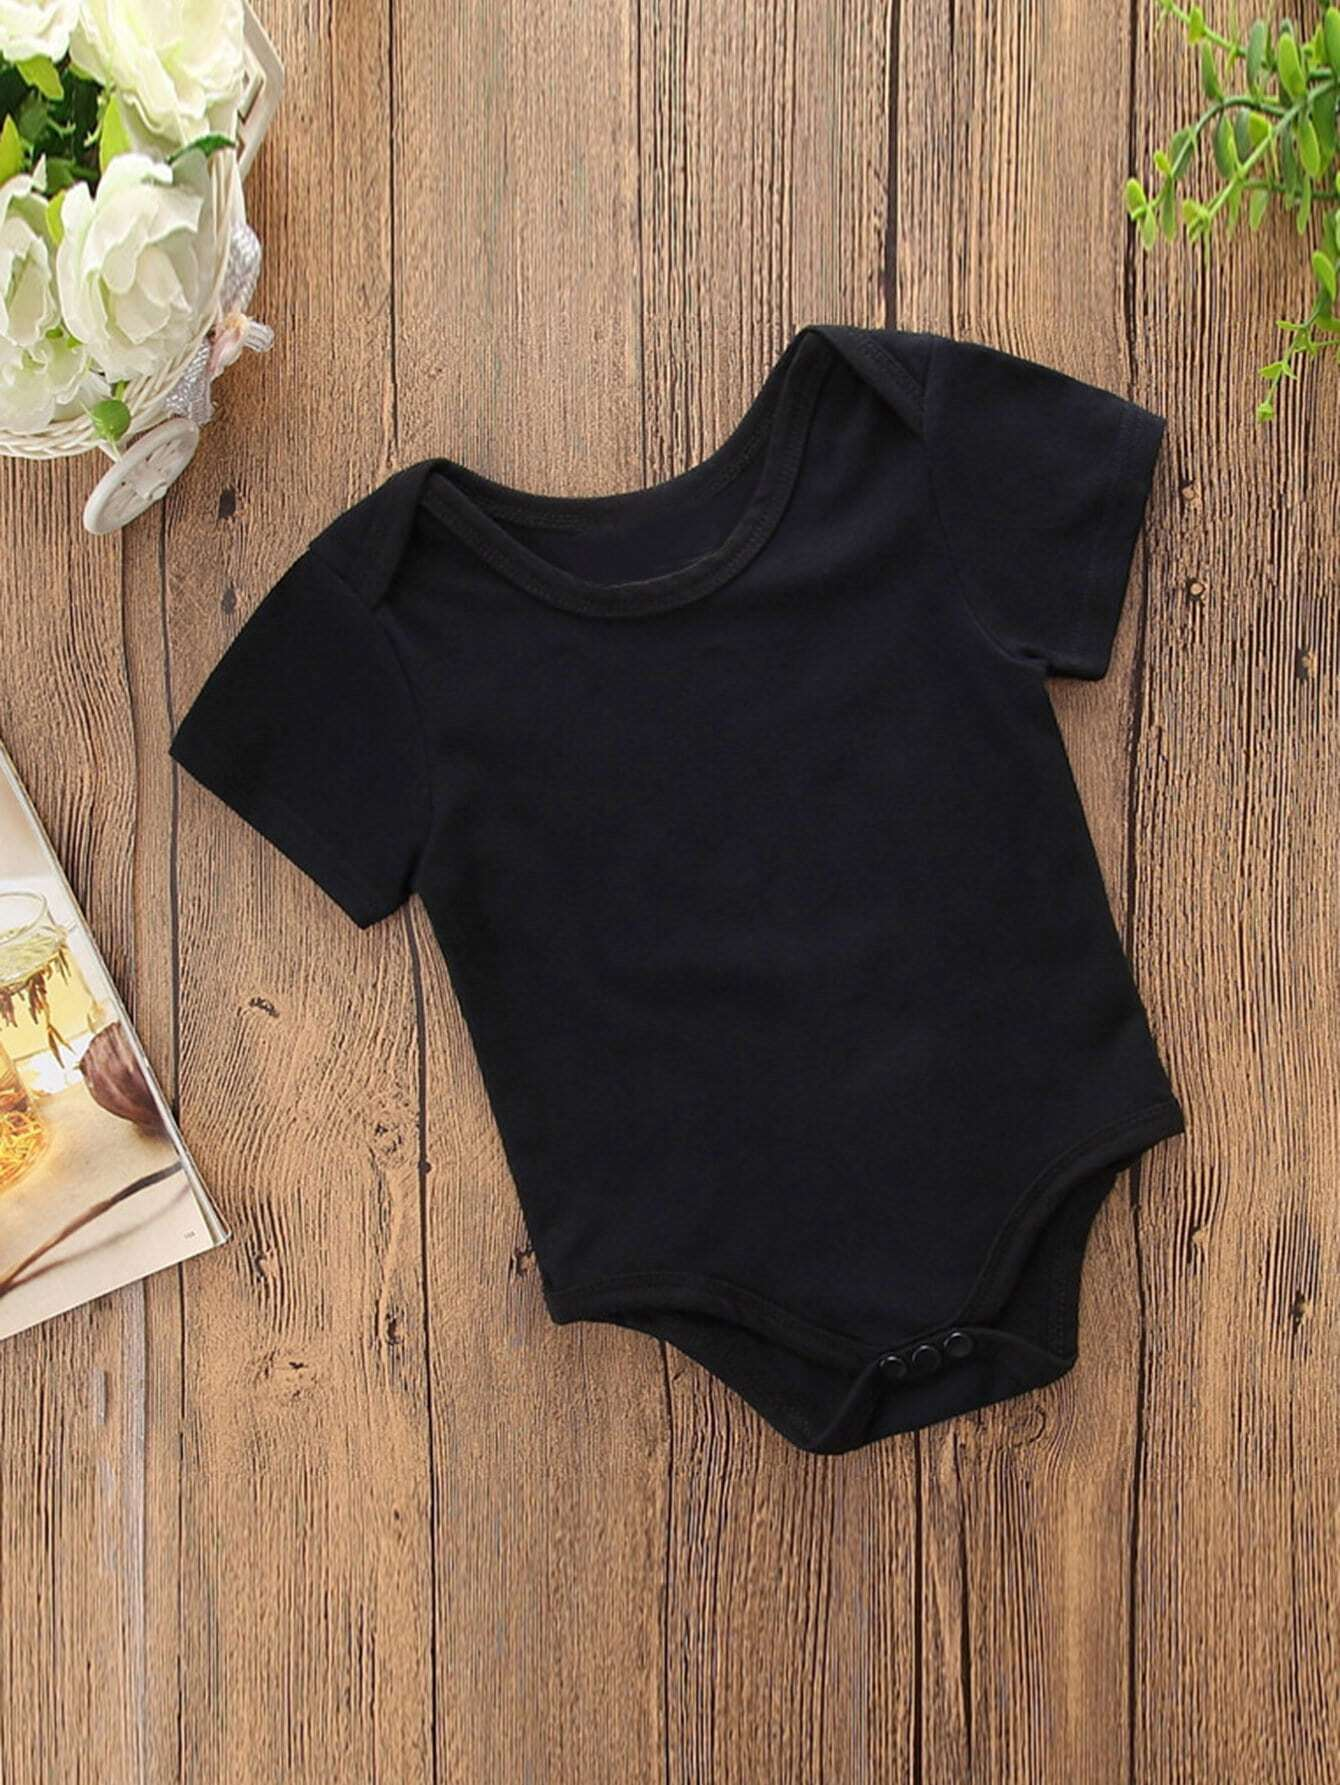 Boys Baby Solid Color Romper newborn baby boy girl infant warm cotton outfit jumpsuit romper bodysuit clothes